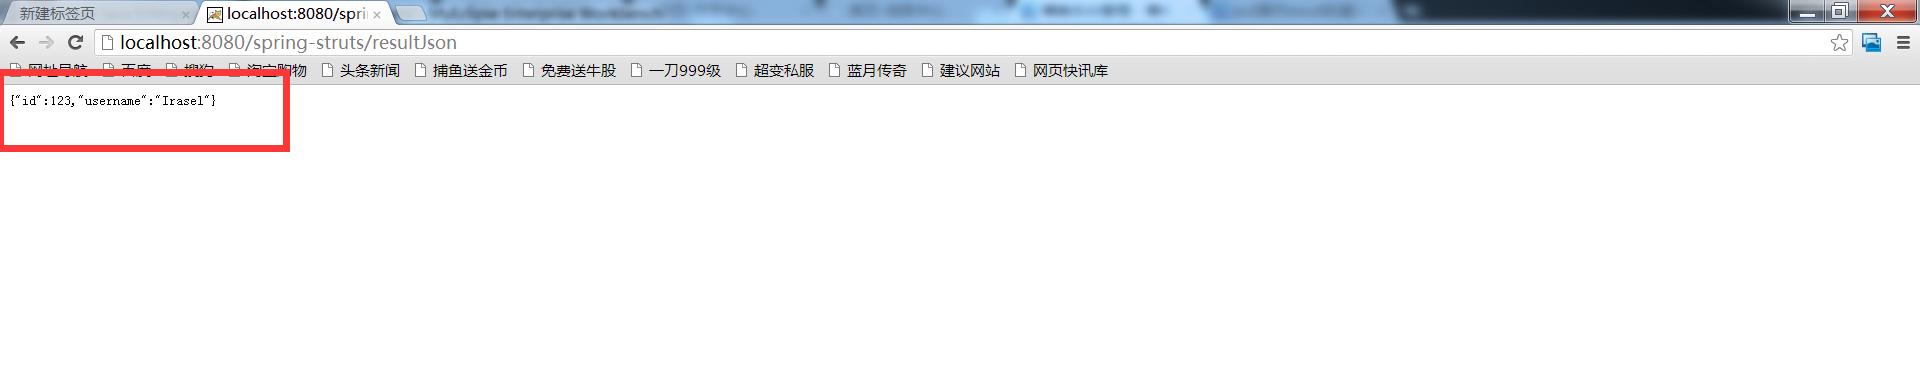 Java資源大全中文版(Awesome最新版),javaawesome_JAVA綜合教程